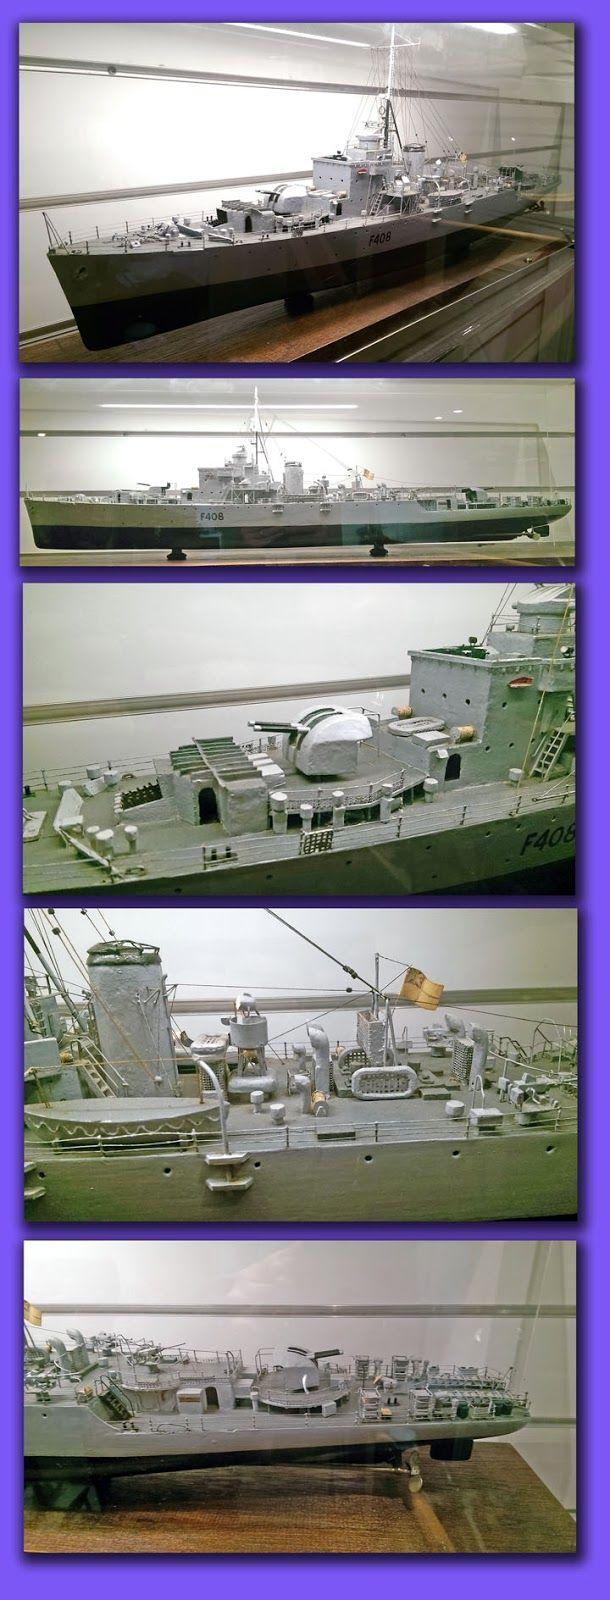 HMAS COLGOA  (K408/F408/A256), named for the Culgoa River, was a Modified River (or Bay) class frigate